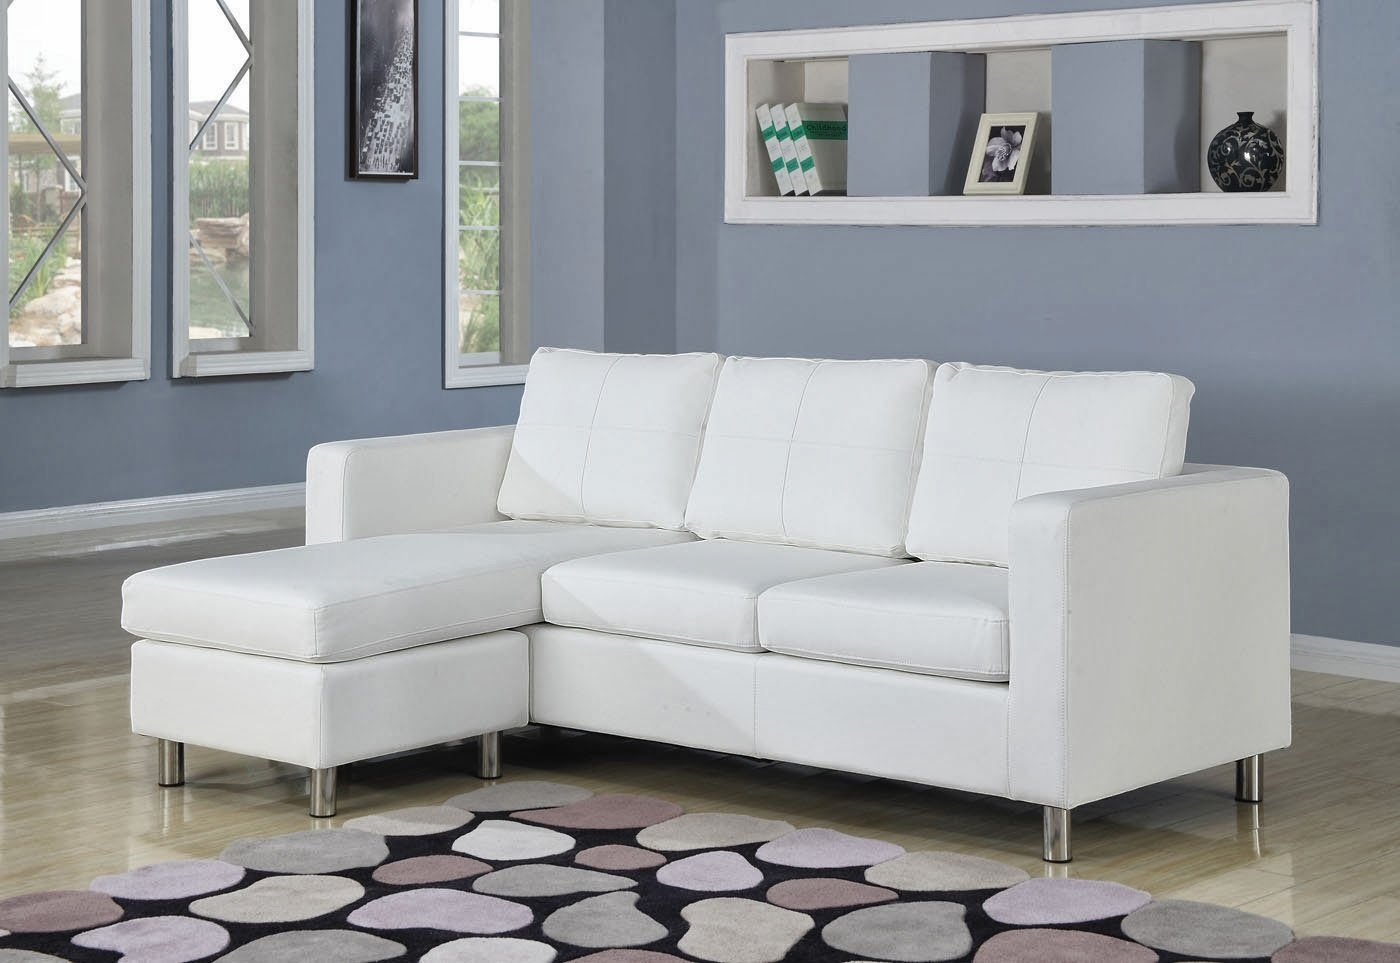 Dibawah ini kami hadirkan beberapa model kursi sofa minimalis untuk ...